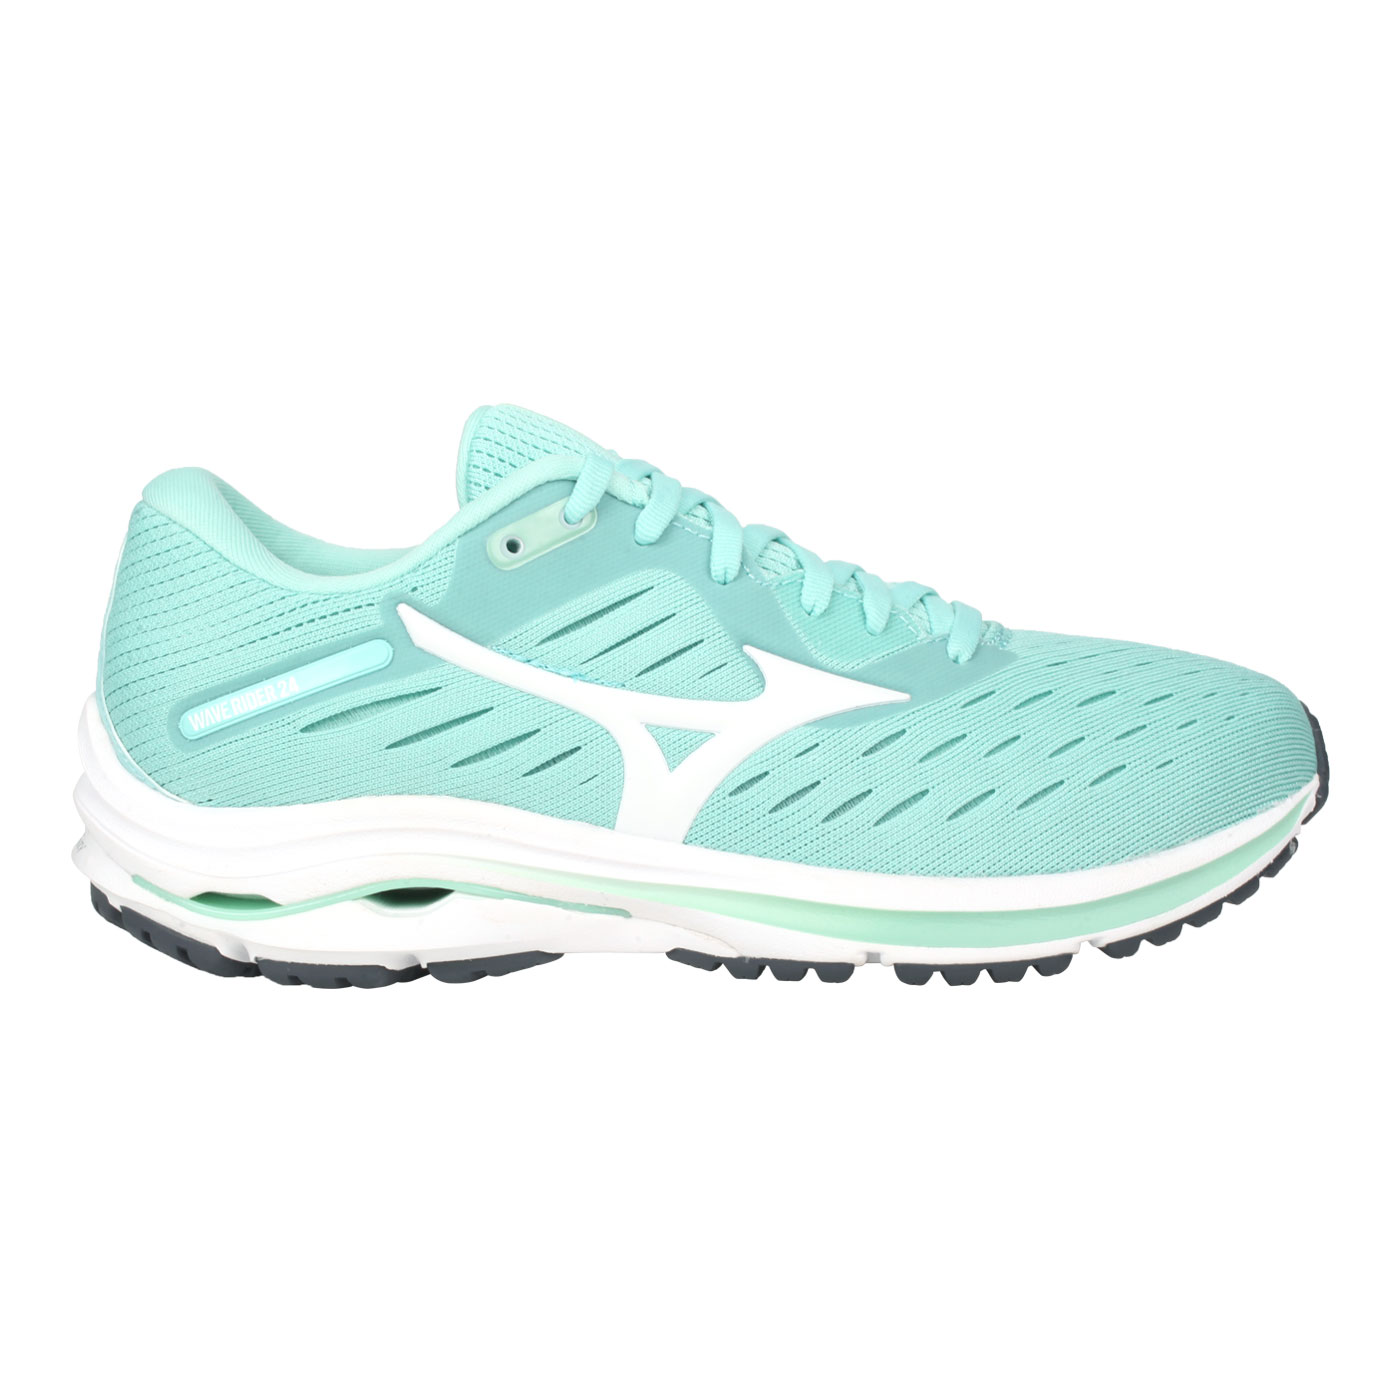 MIZUNO 女款慢跑鞋  @WAVE RIDER 24@J1GD200301 - 湖水綠白